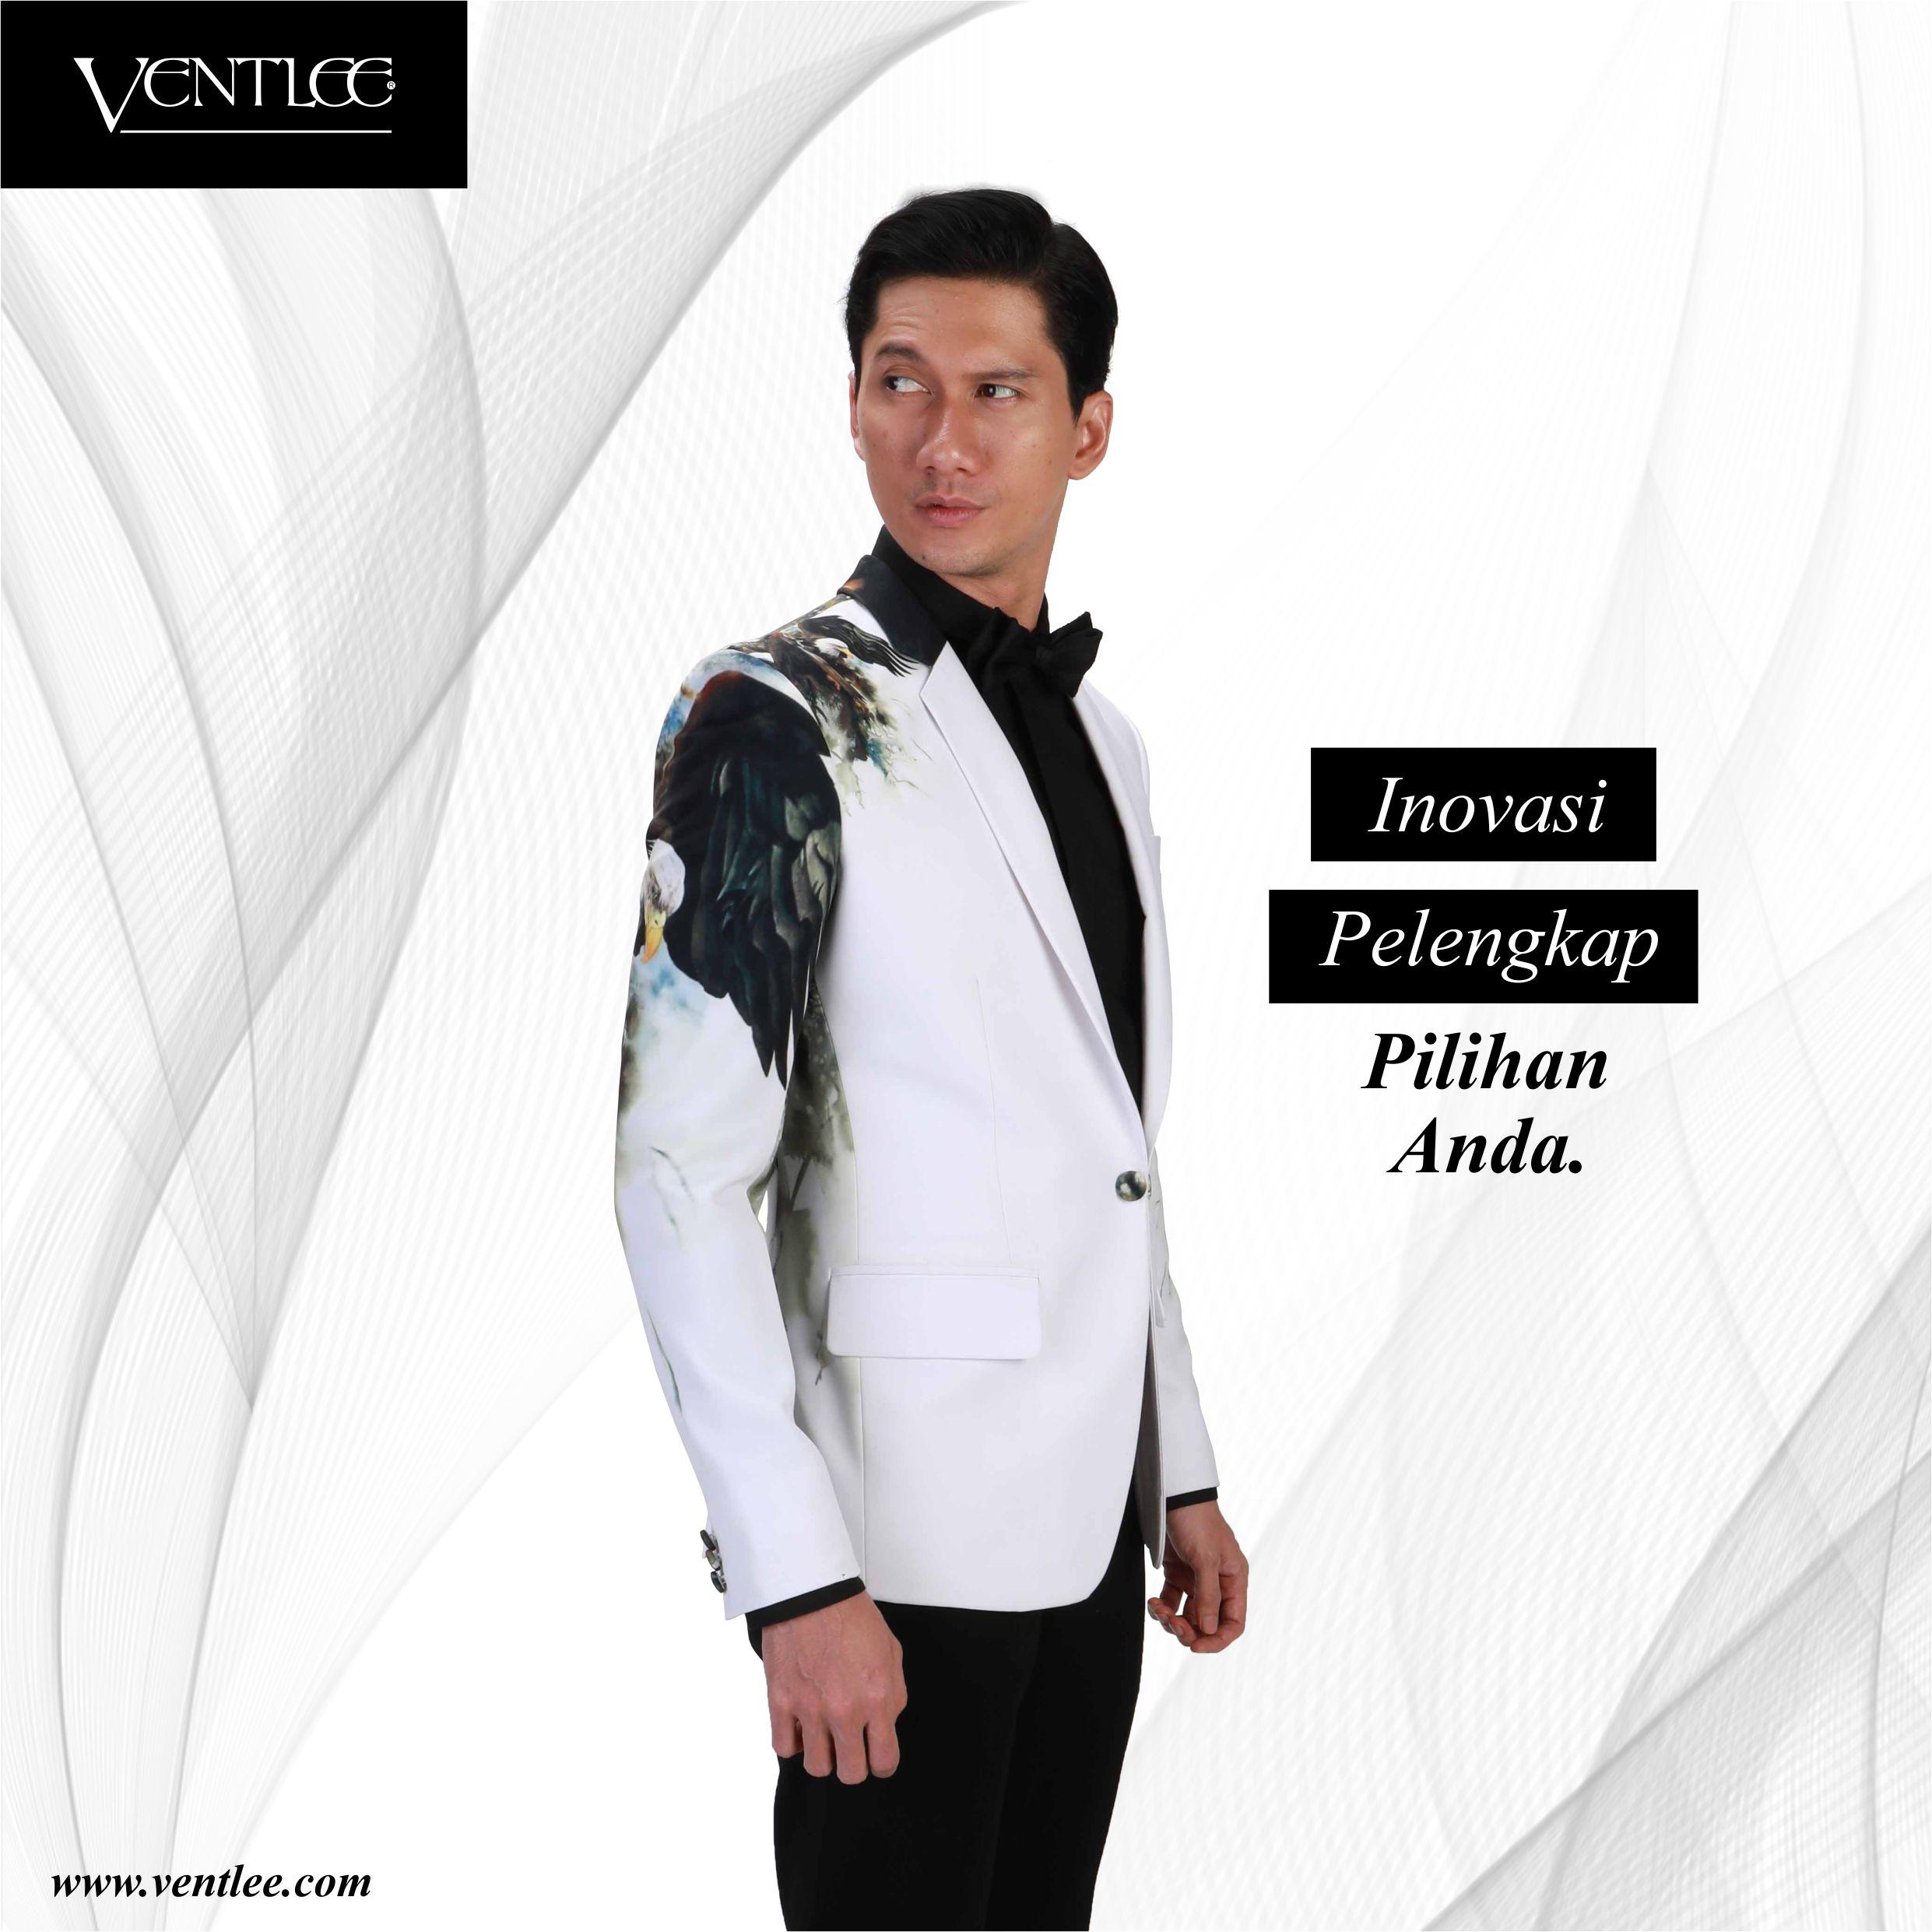 Future Of Men Suit By Ventlee Groom Centre Houseofcuff Collar Bar Lapel Pin Bros Jas Wedding Best Man Bow Tie Grey